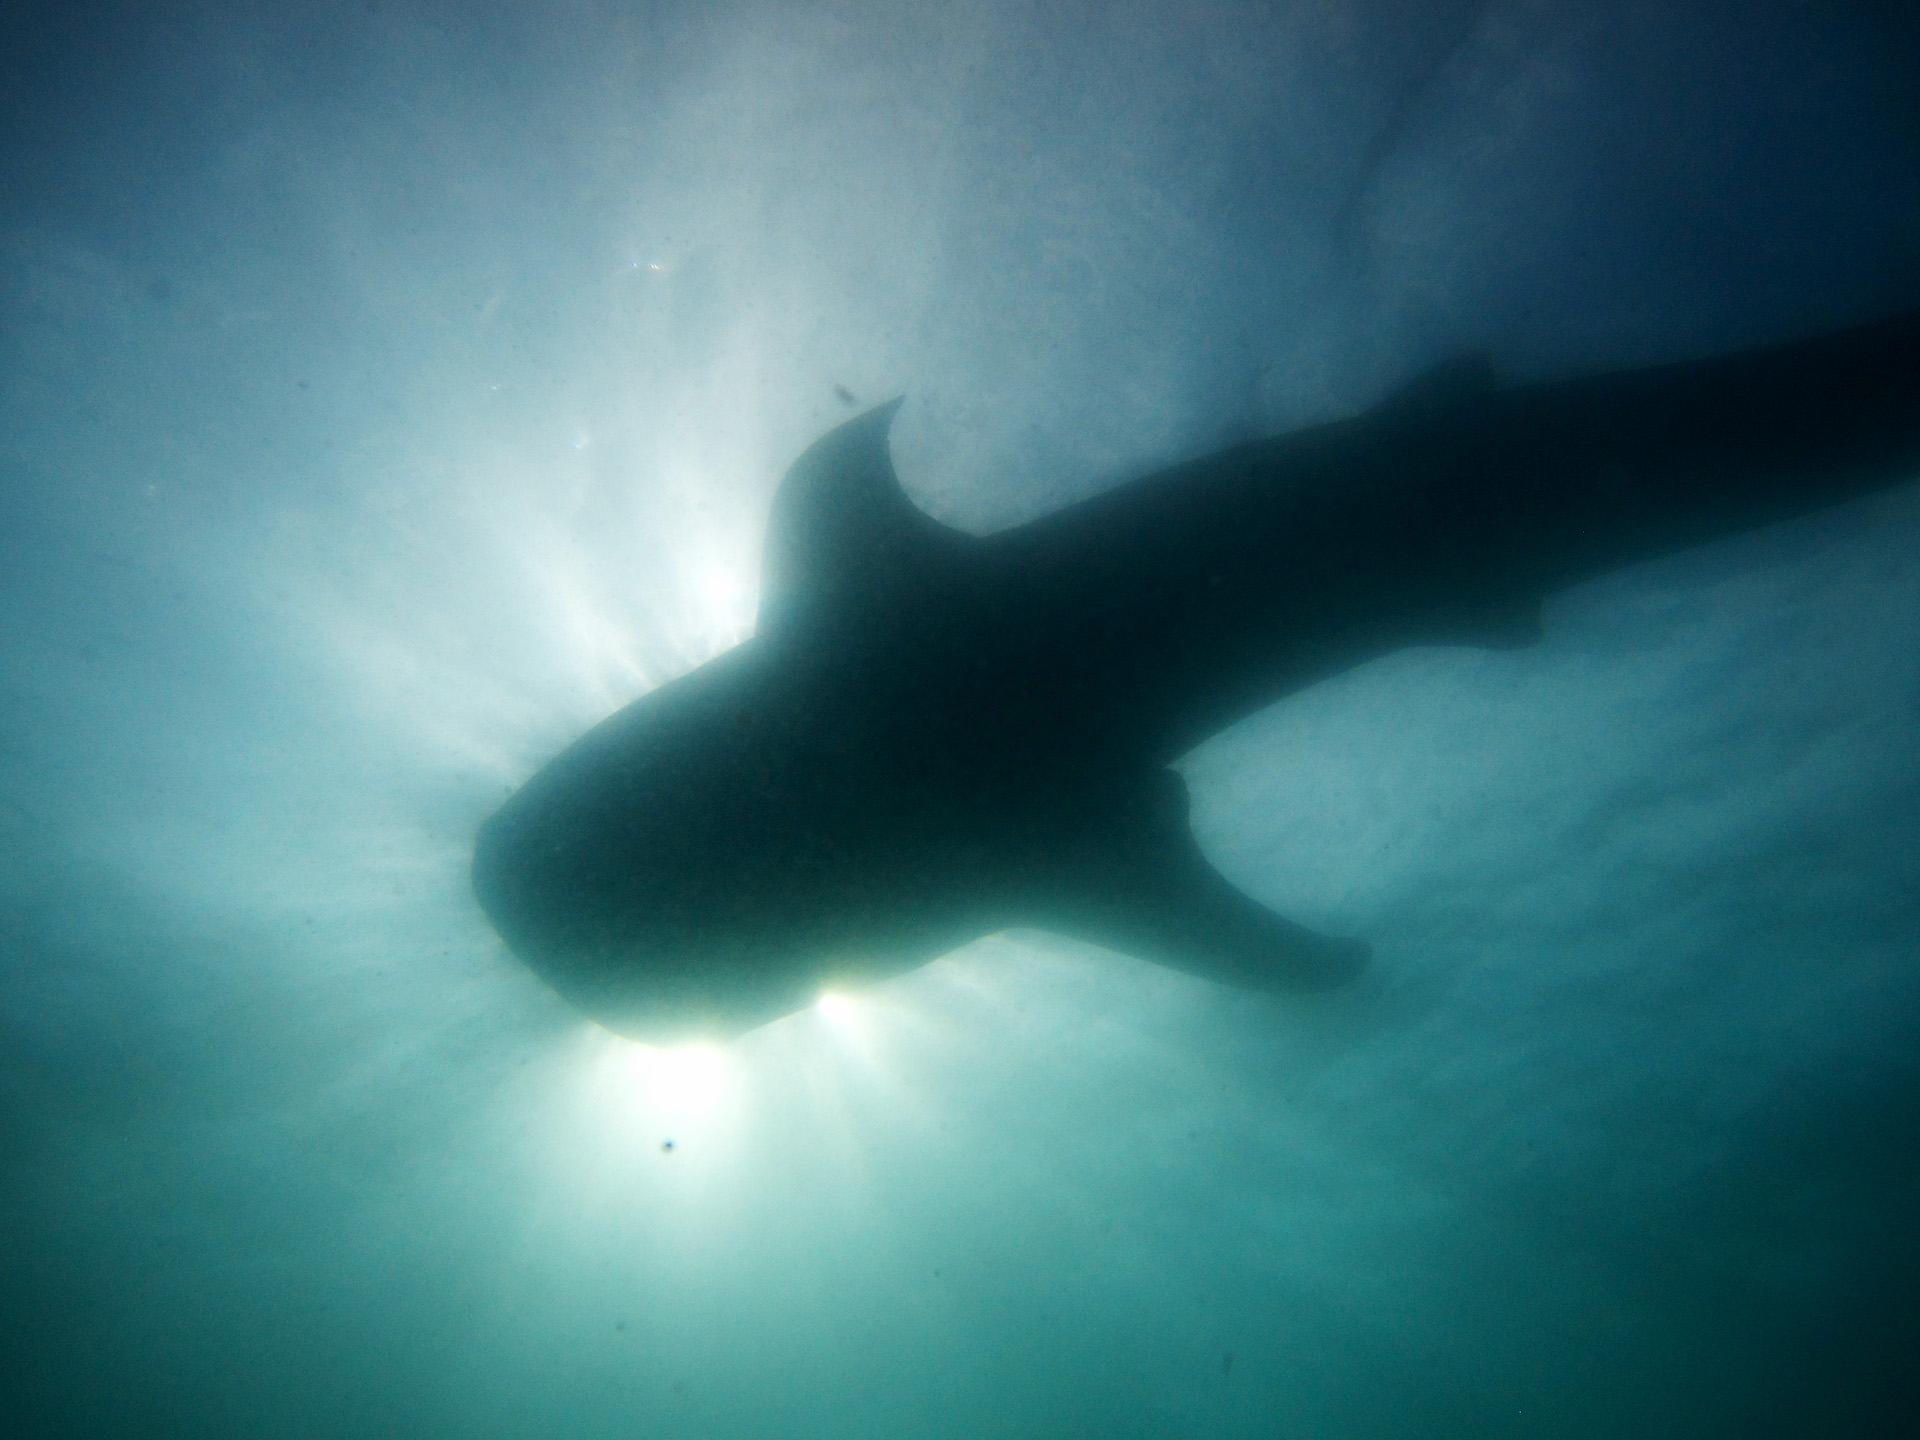 Whale Shark silhouette, Oslob, Philippines.